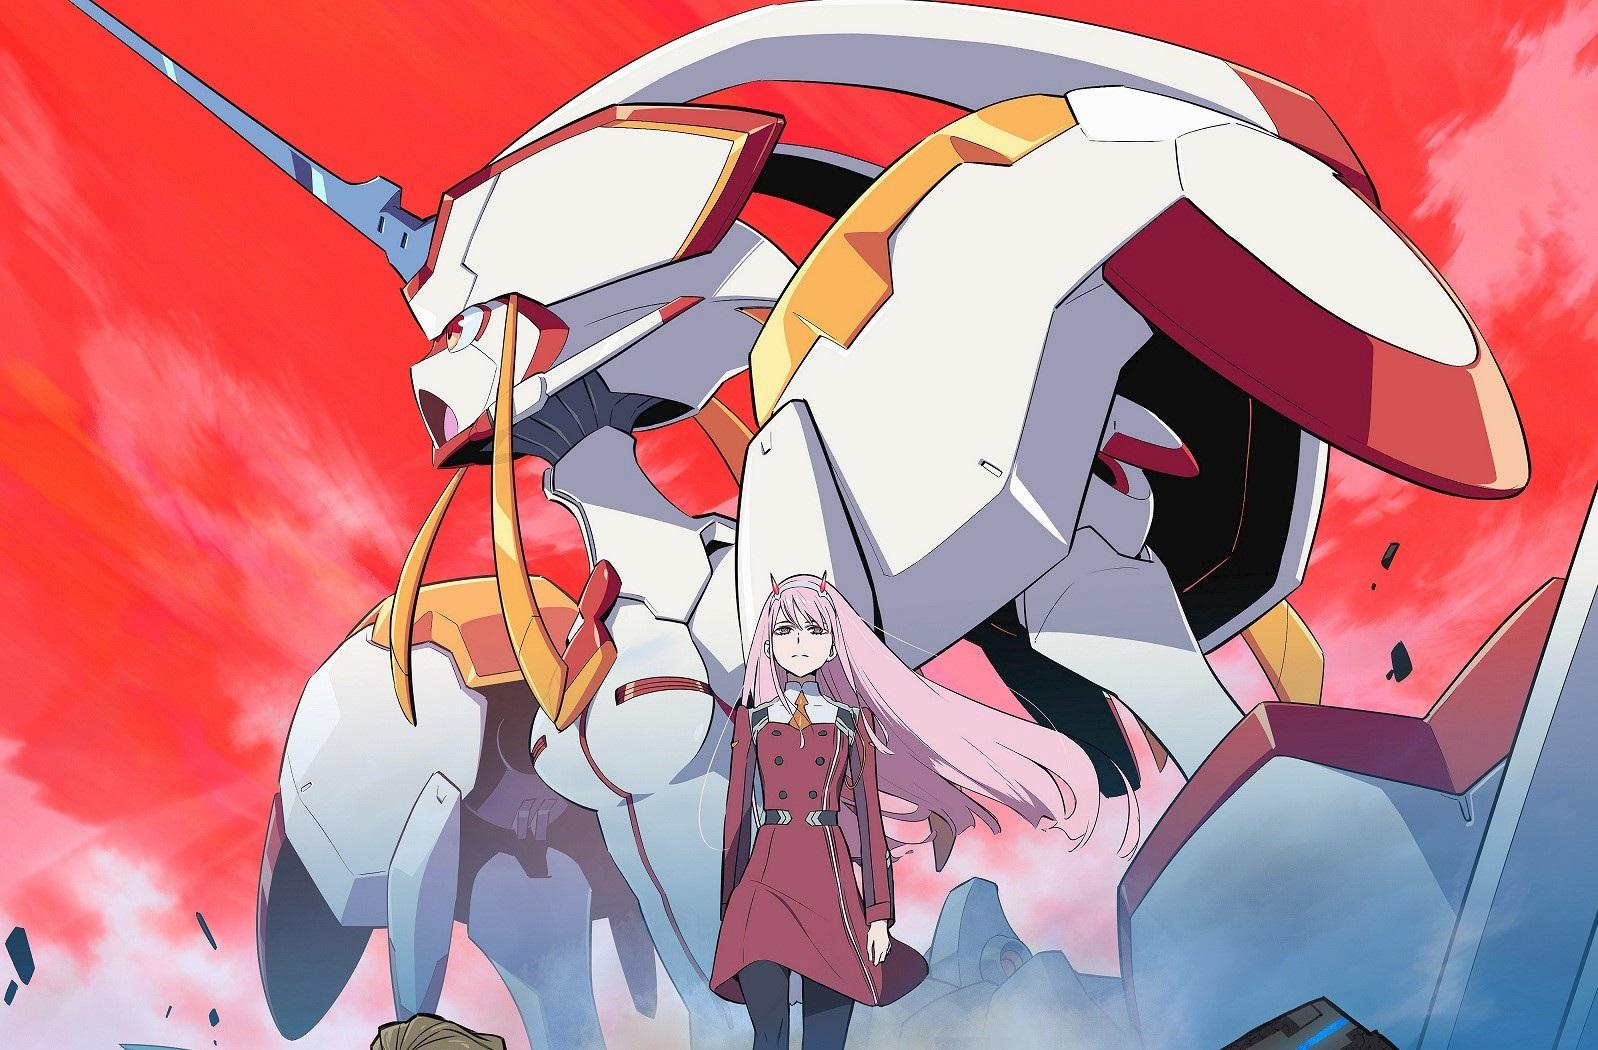 Darling in the FranXX anime wallpaper hd